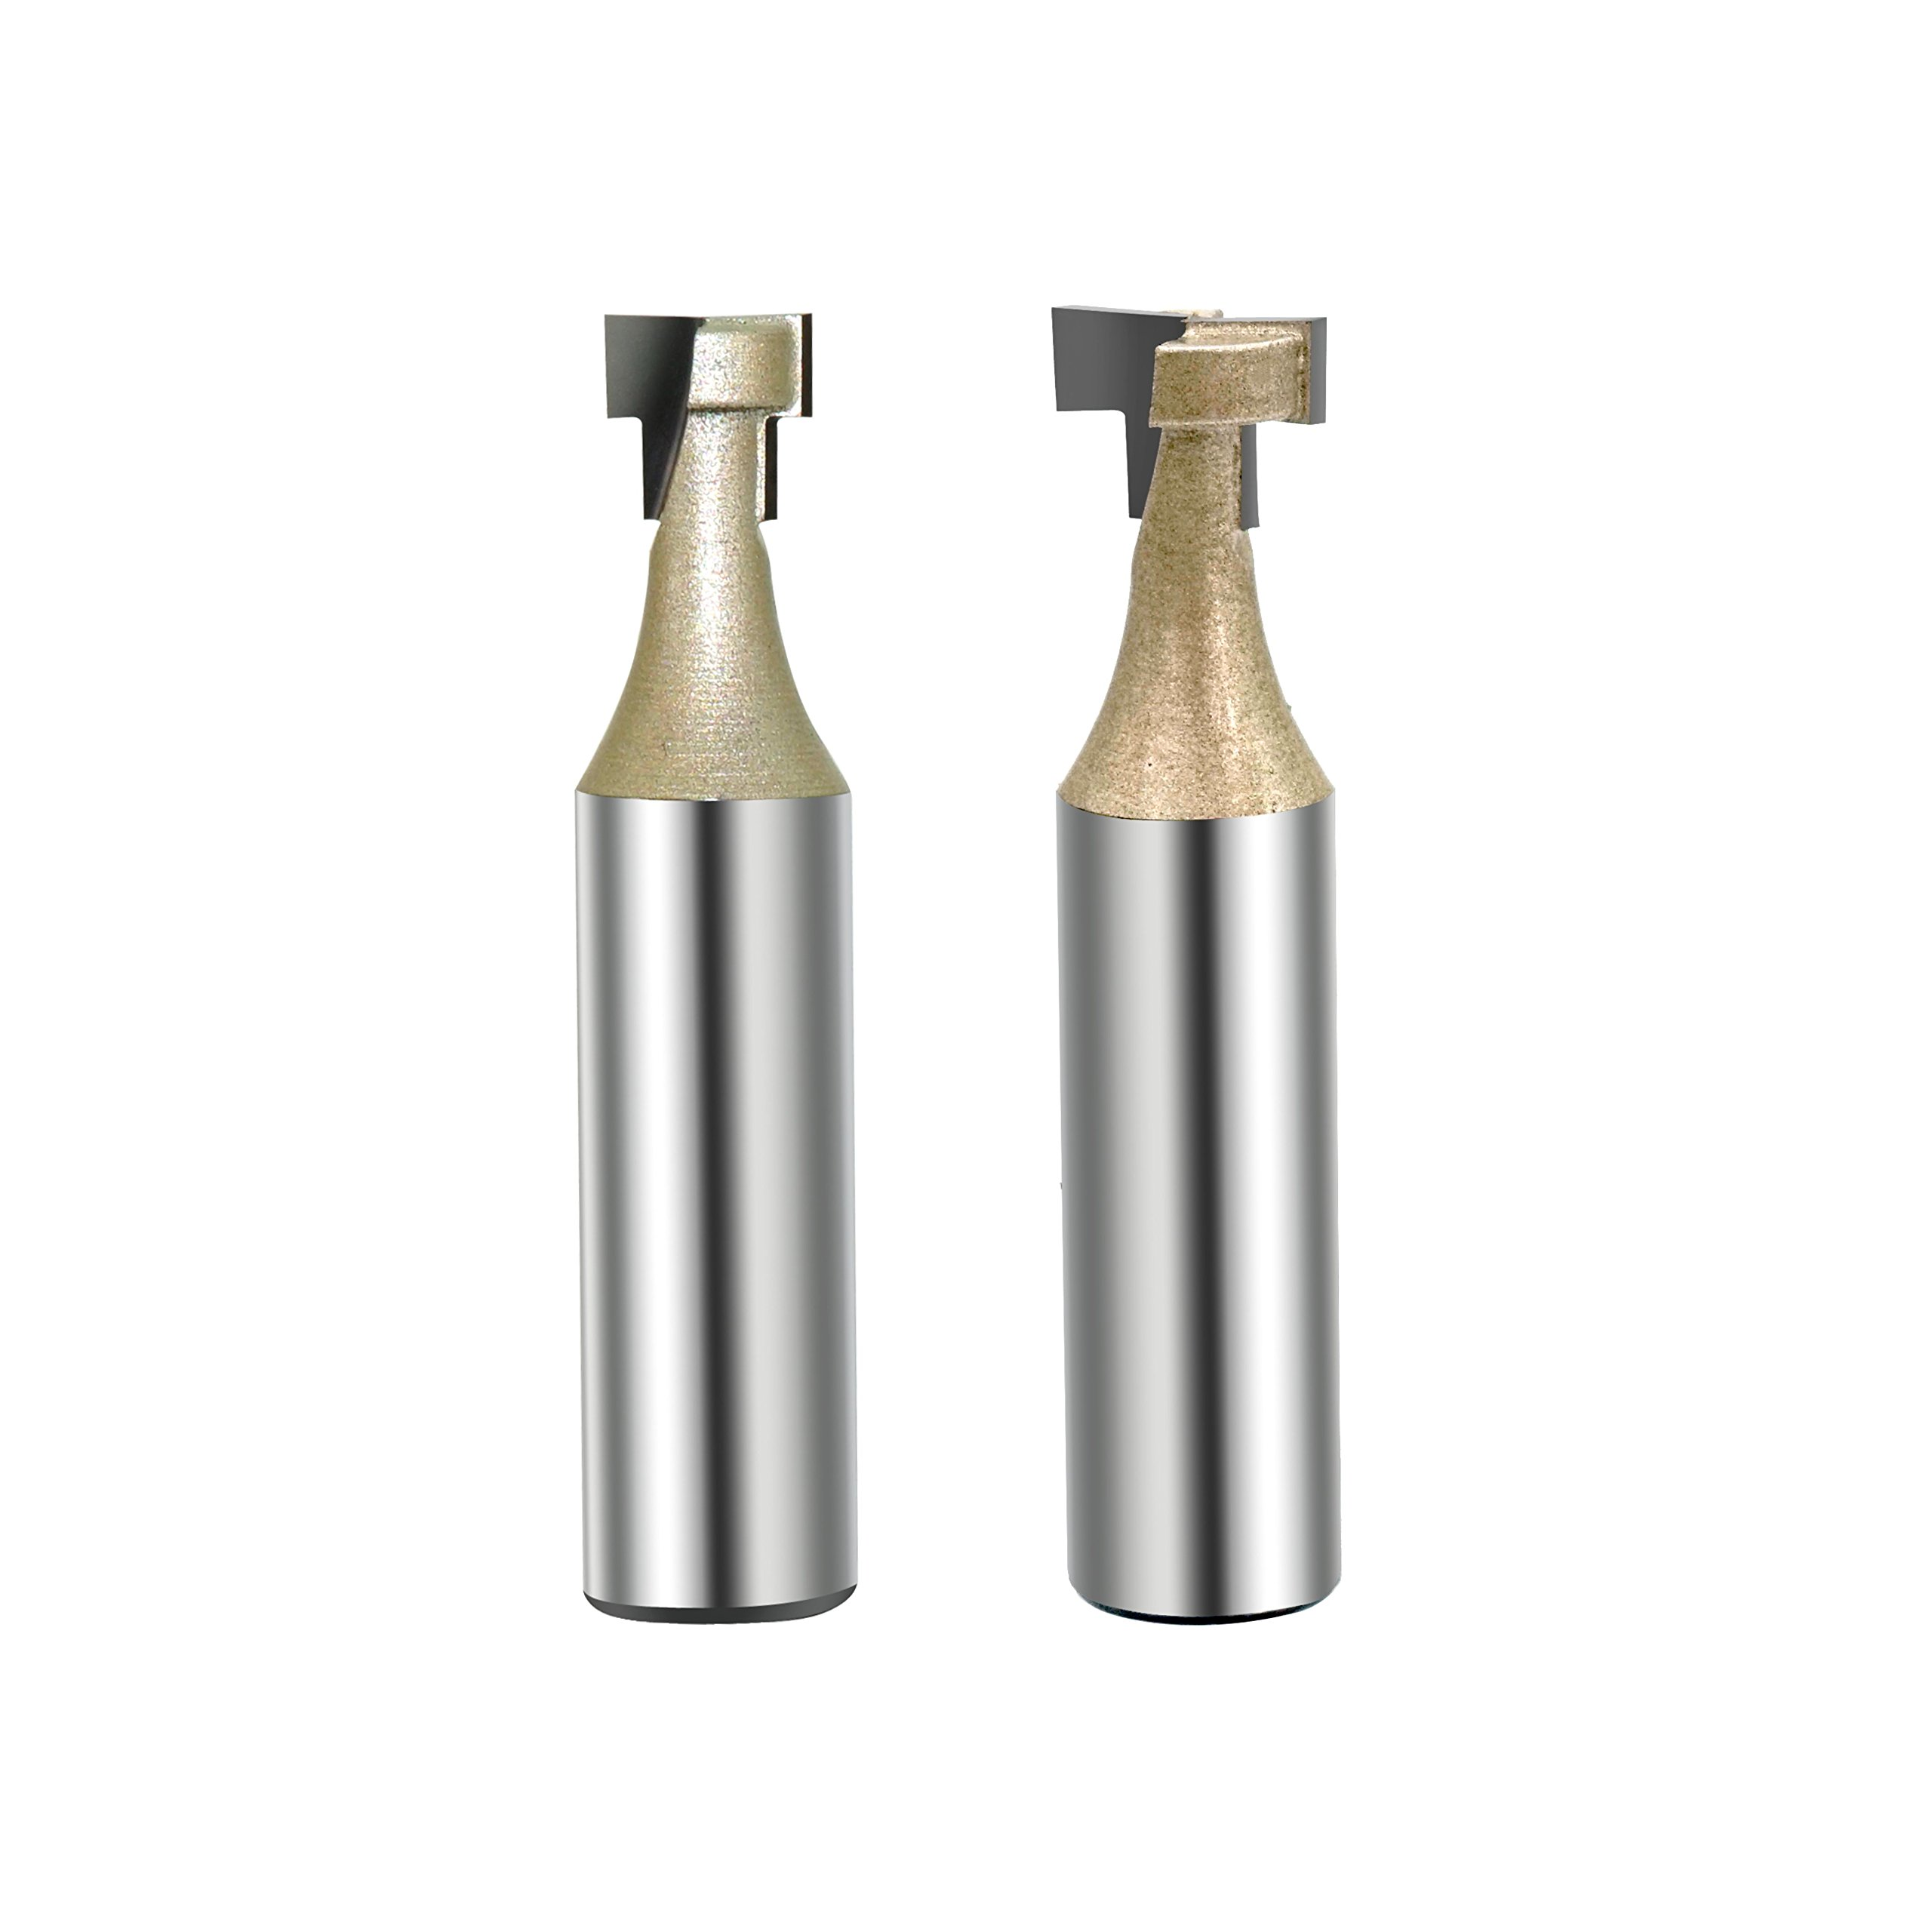 Gazeto 2pcs Carbide Tipped CNC Keyhole Router Bit Cutter Set, 3/8-Inch and 1/2-Inch Cutting Diameter, 1/2-Inch Shank, 3/16-Inch Cutting Length